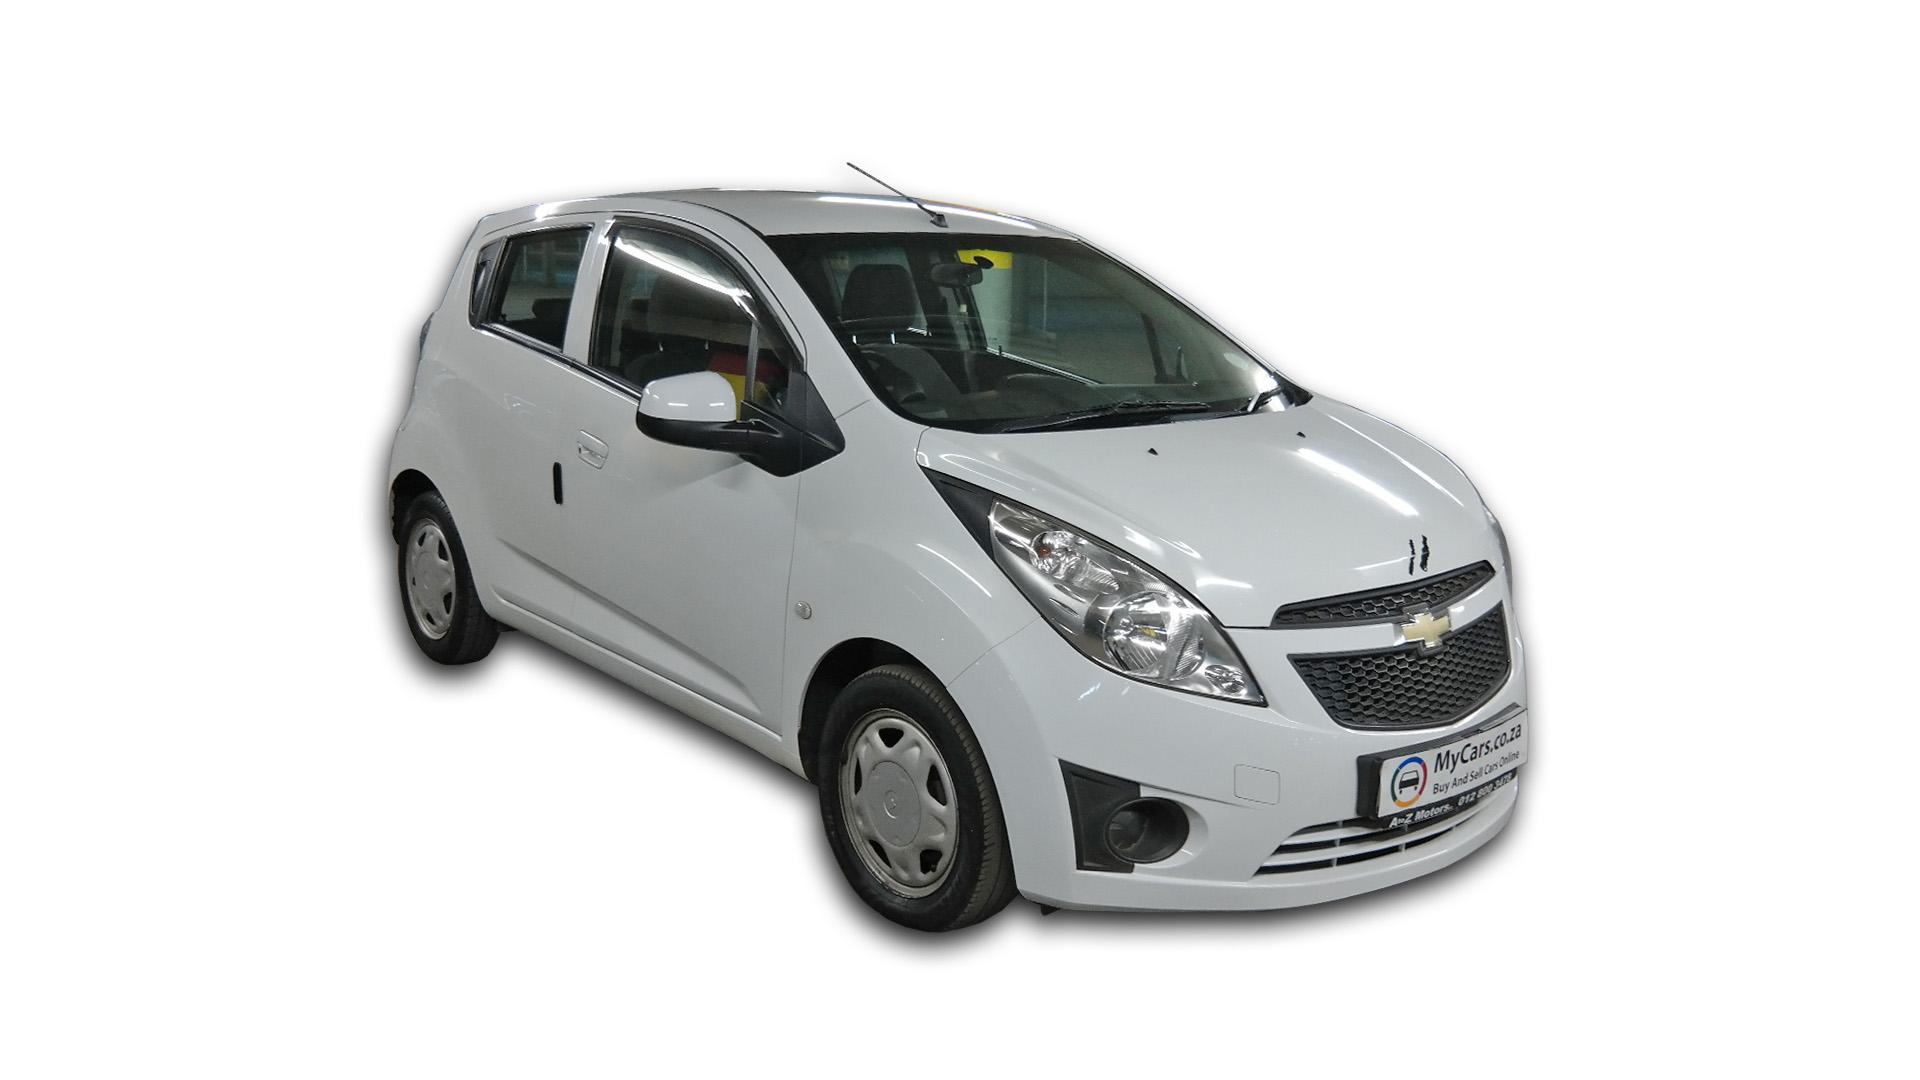 Chevrolet Spark 1.2 CAMPUS/CUR